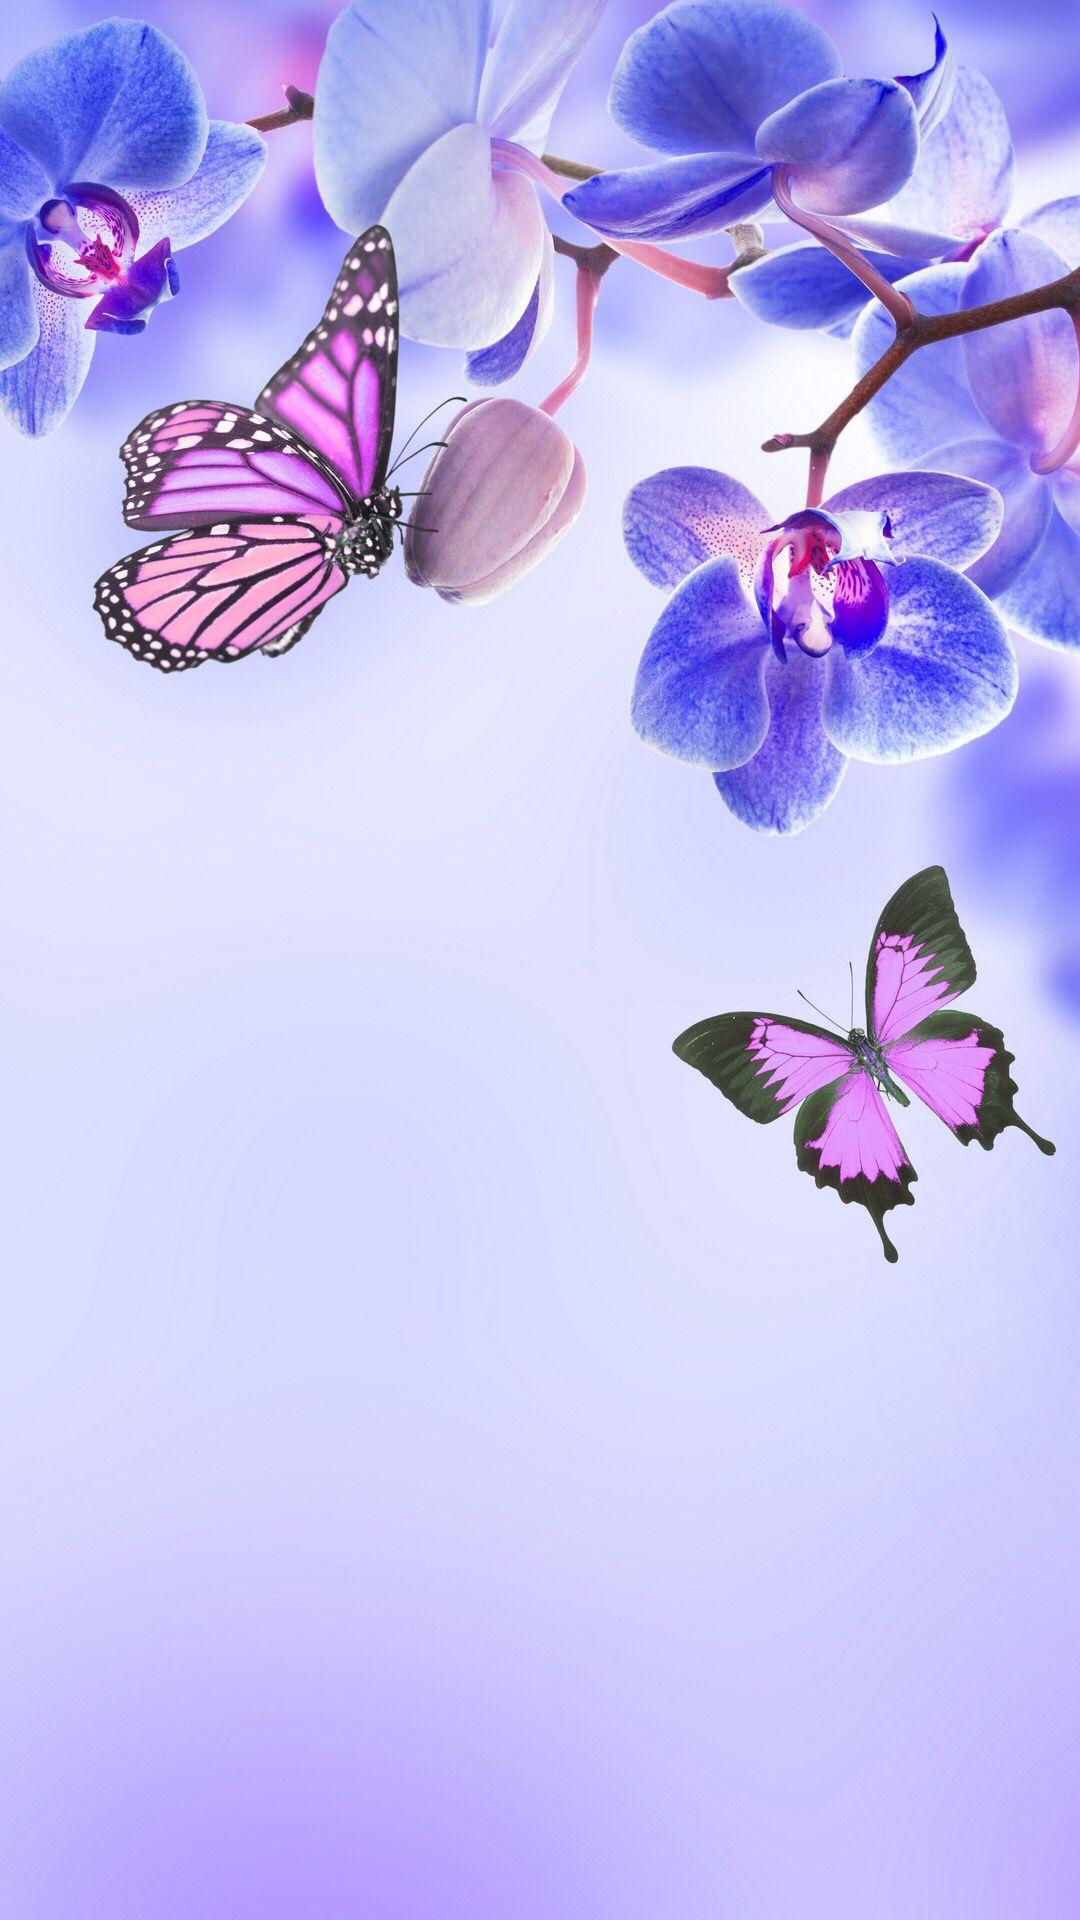 Wallpapers For Phone Orchid Wallpaper Butterfly Wallpaper Hd Flower Wallpaper